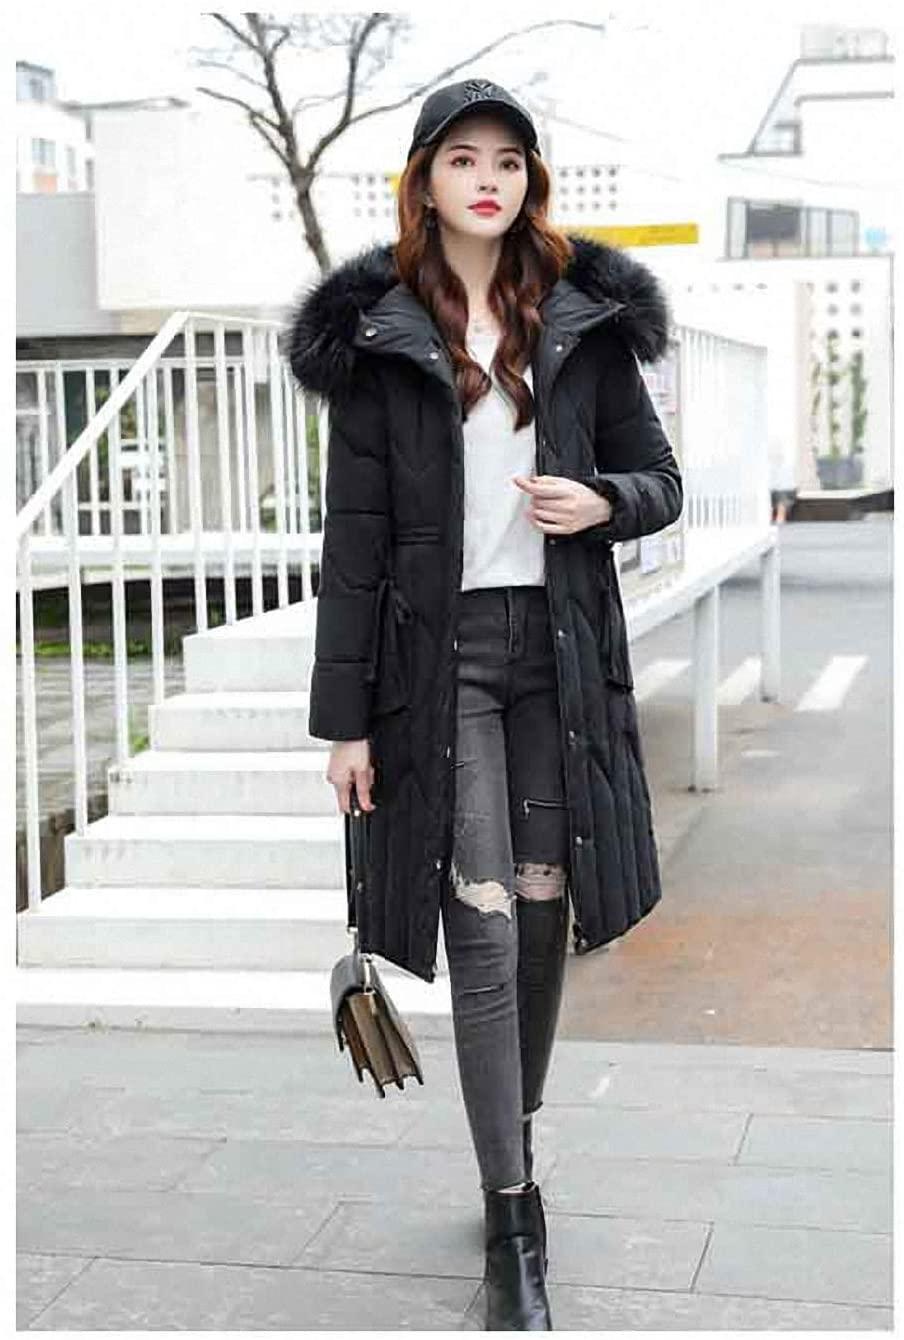 Winter Long Down Cotton Coat Women Thick Warm Fur Collar Plus Size Cotton Jacket Hooded Parka Female Jacket Black 5XL